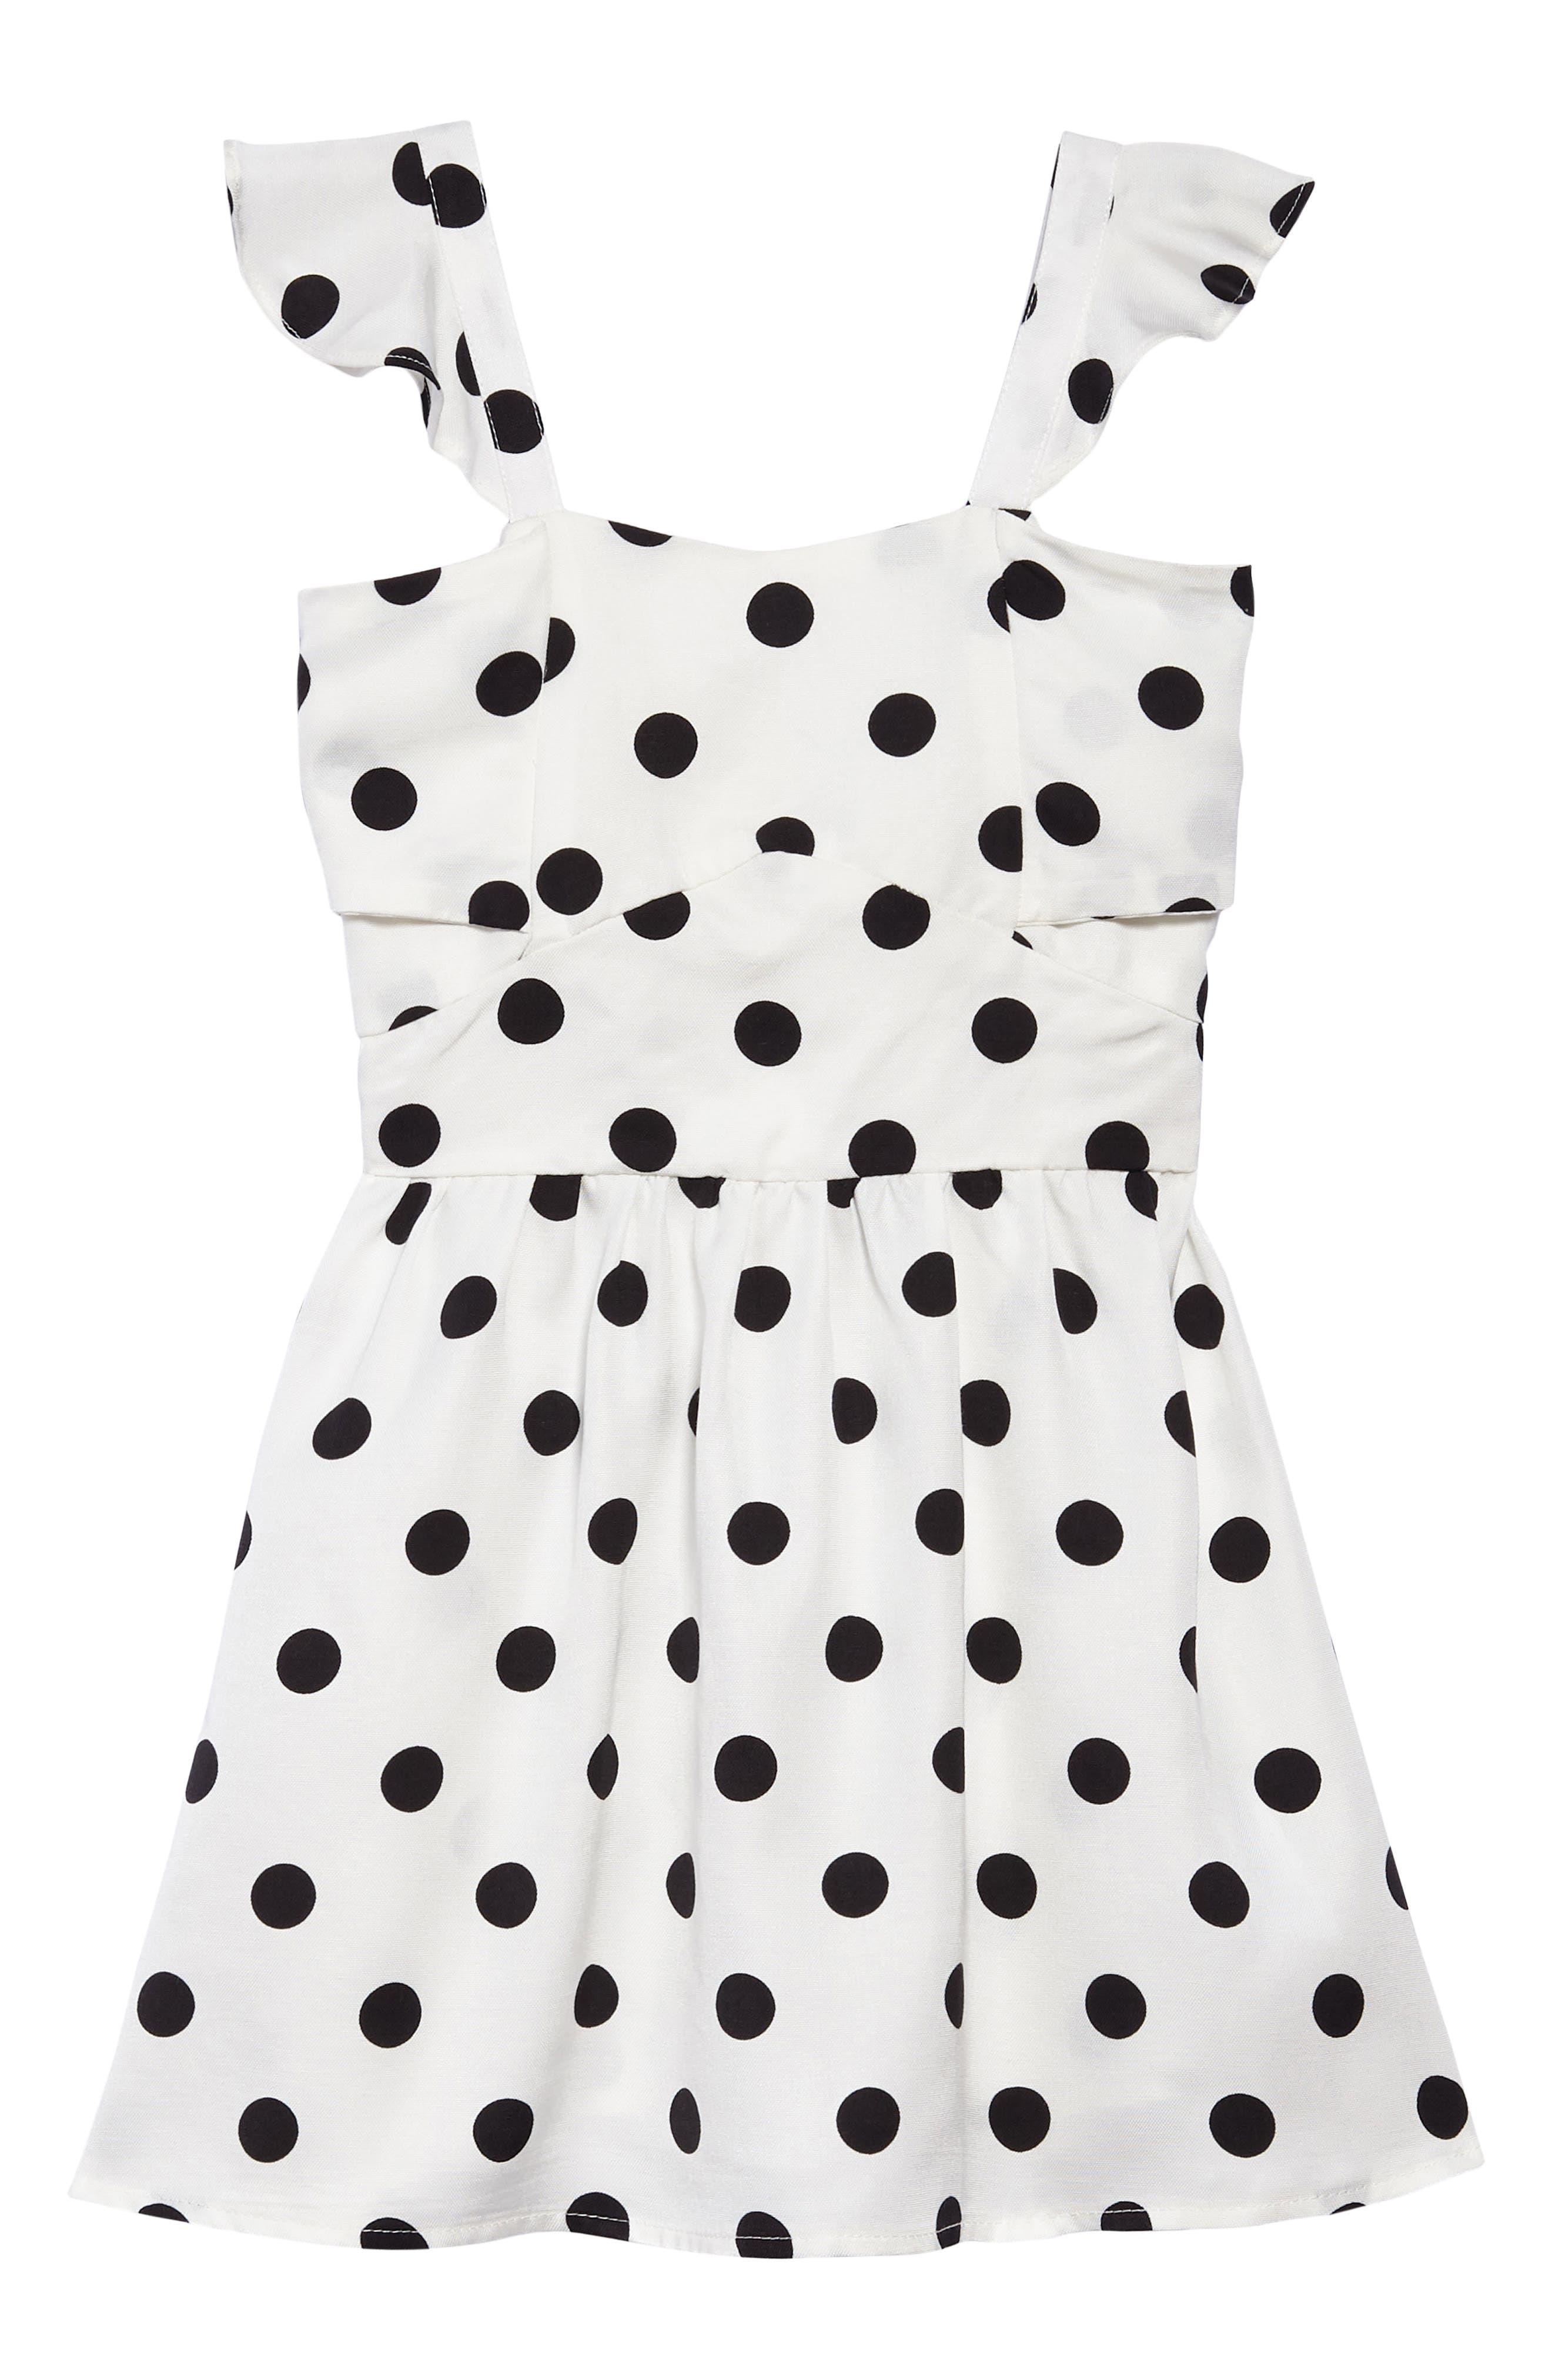 Polka Dot Dress,                         Main,                         color, White Spot